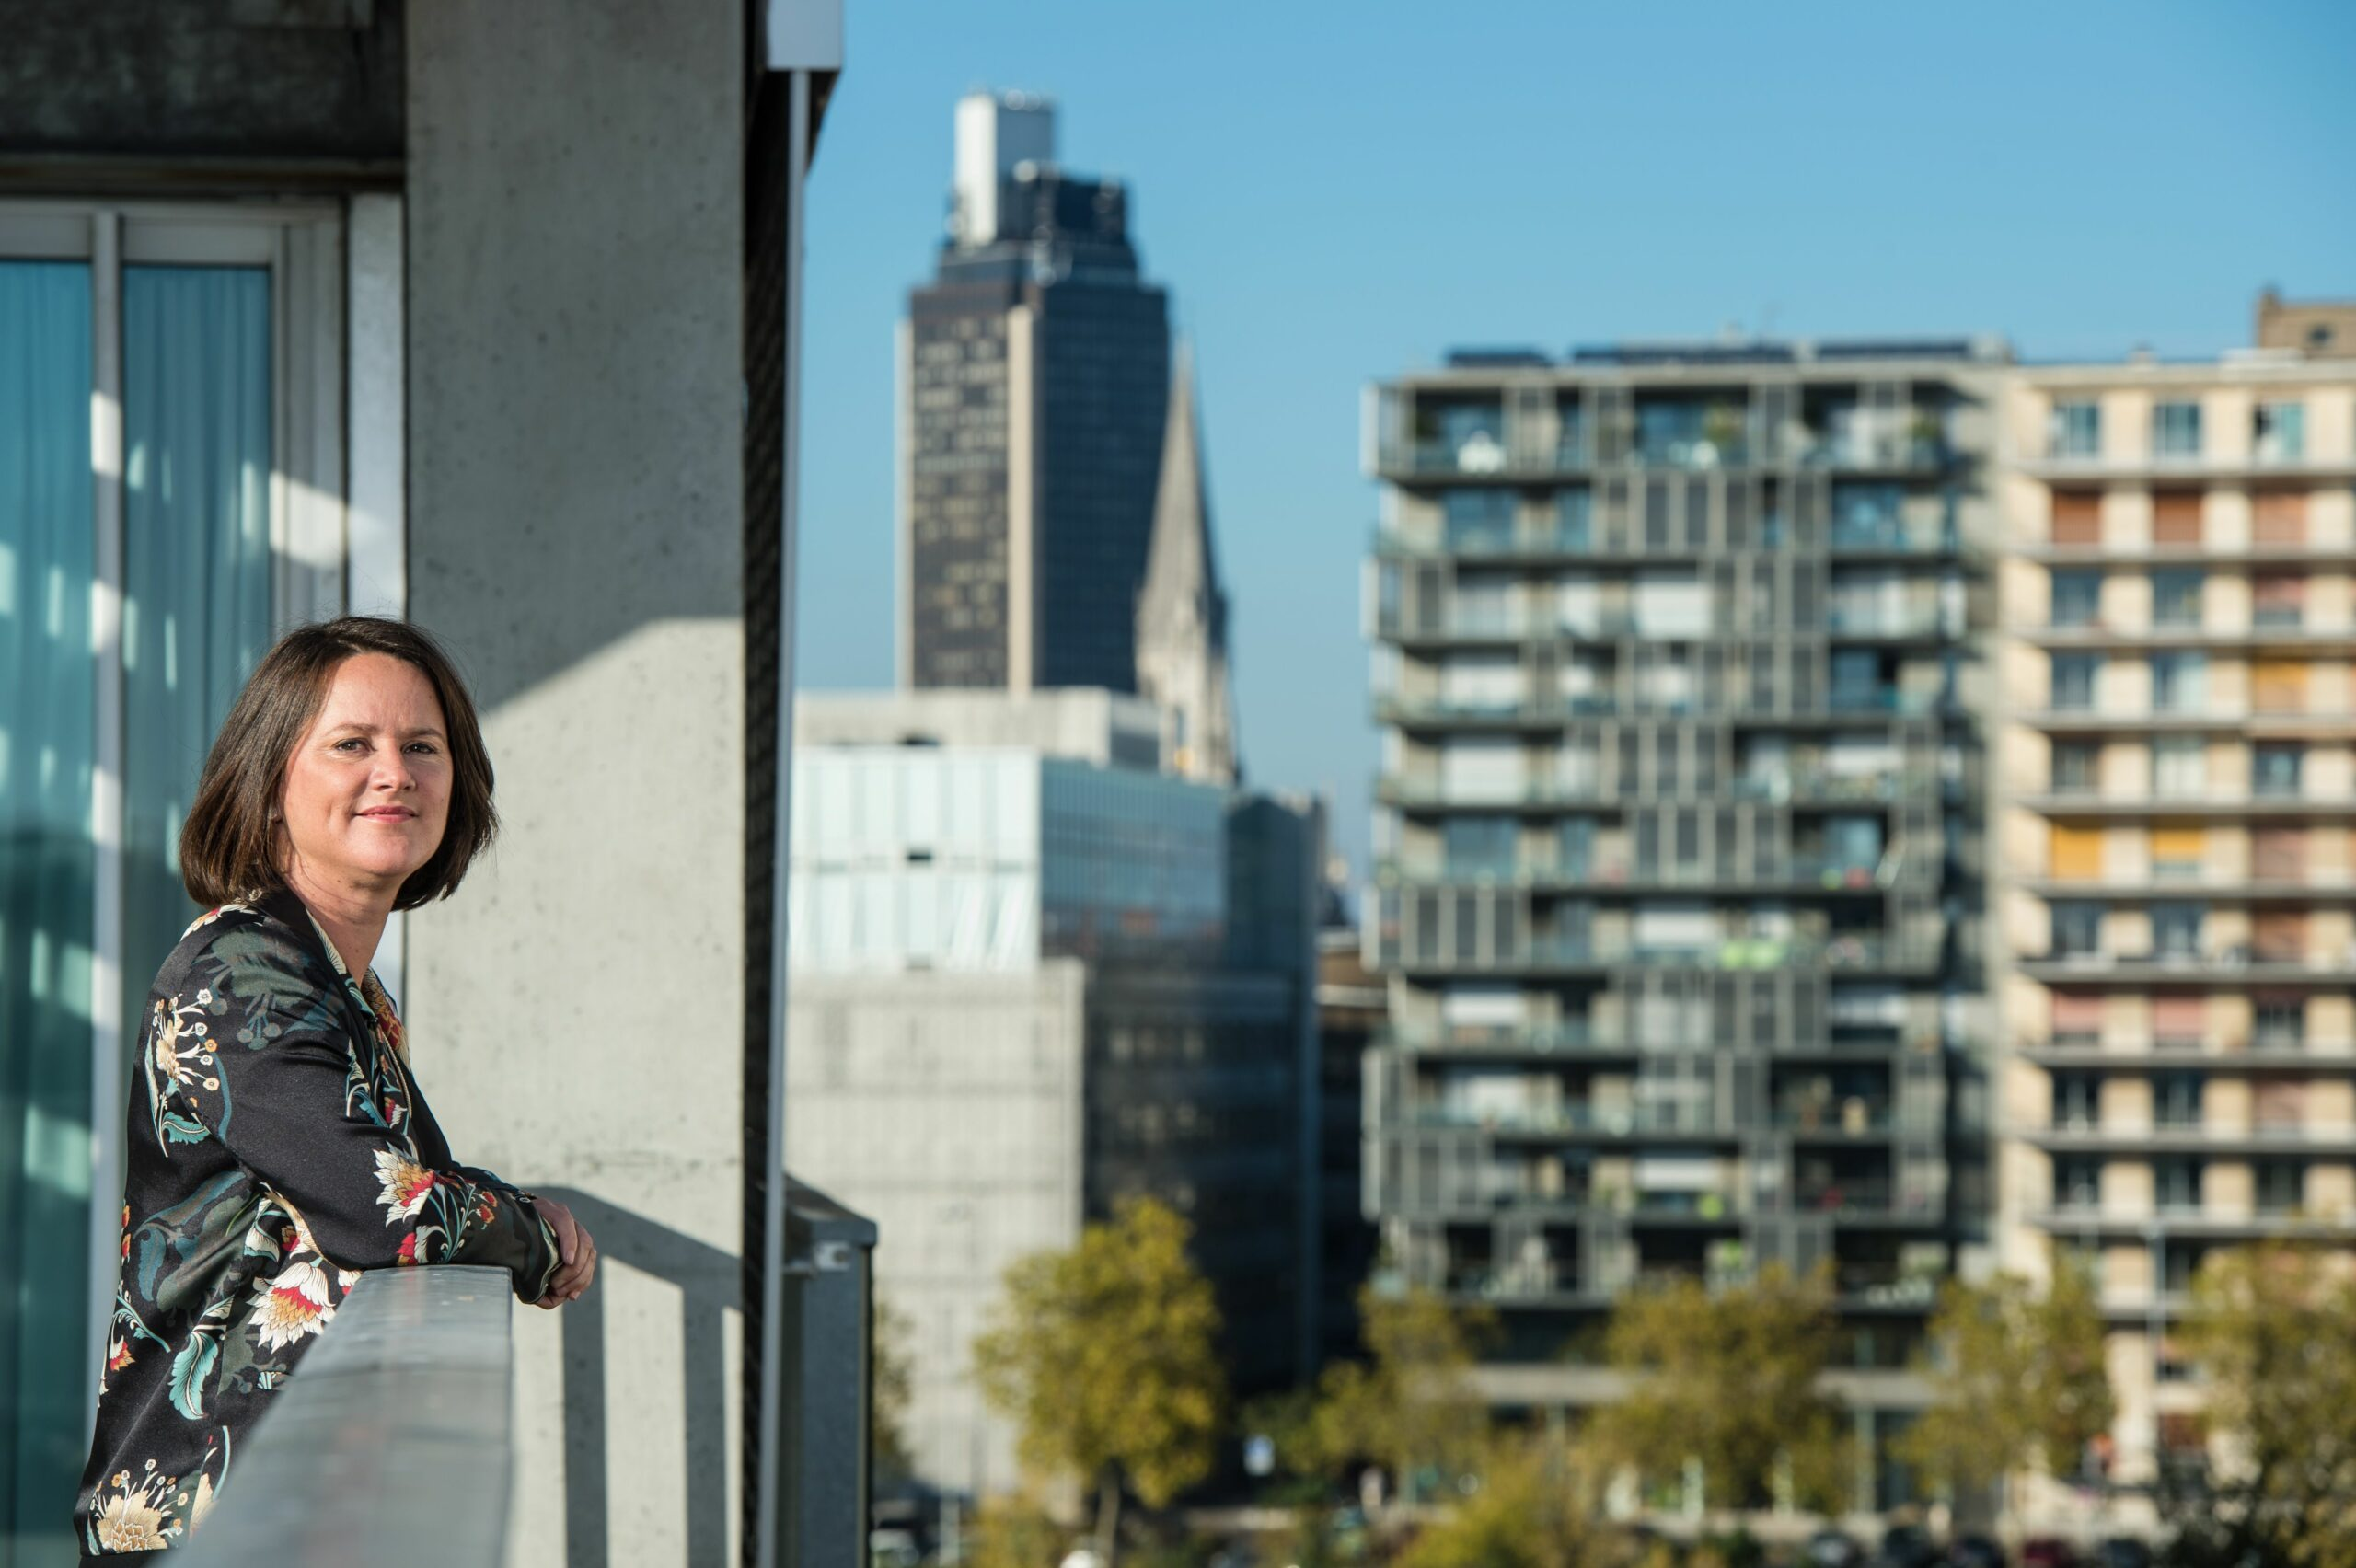 Johanna Rolland, nouvelle présidente de France Urbaine